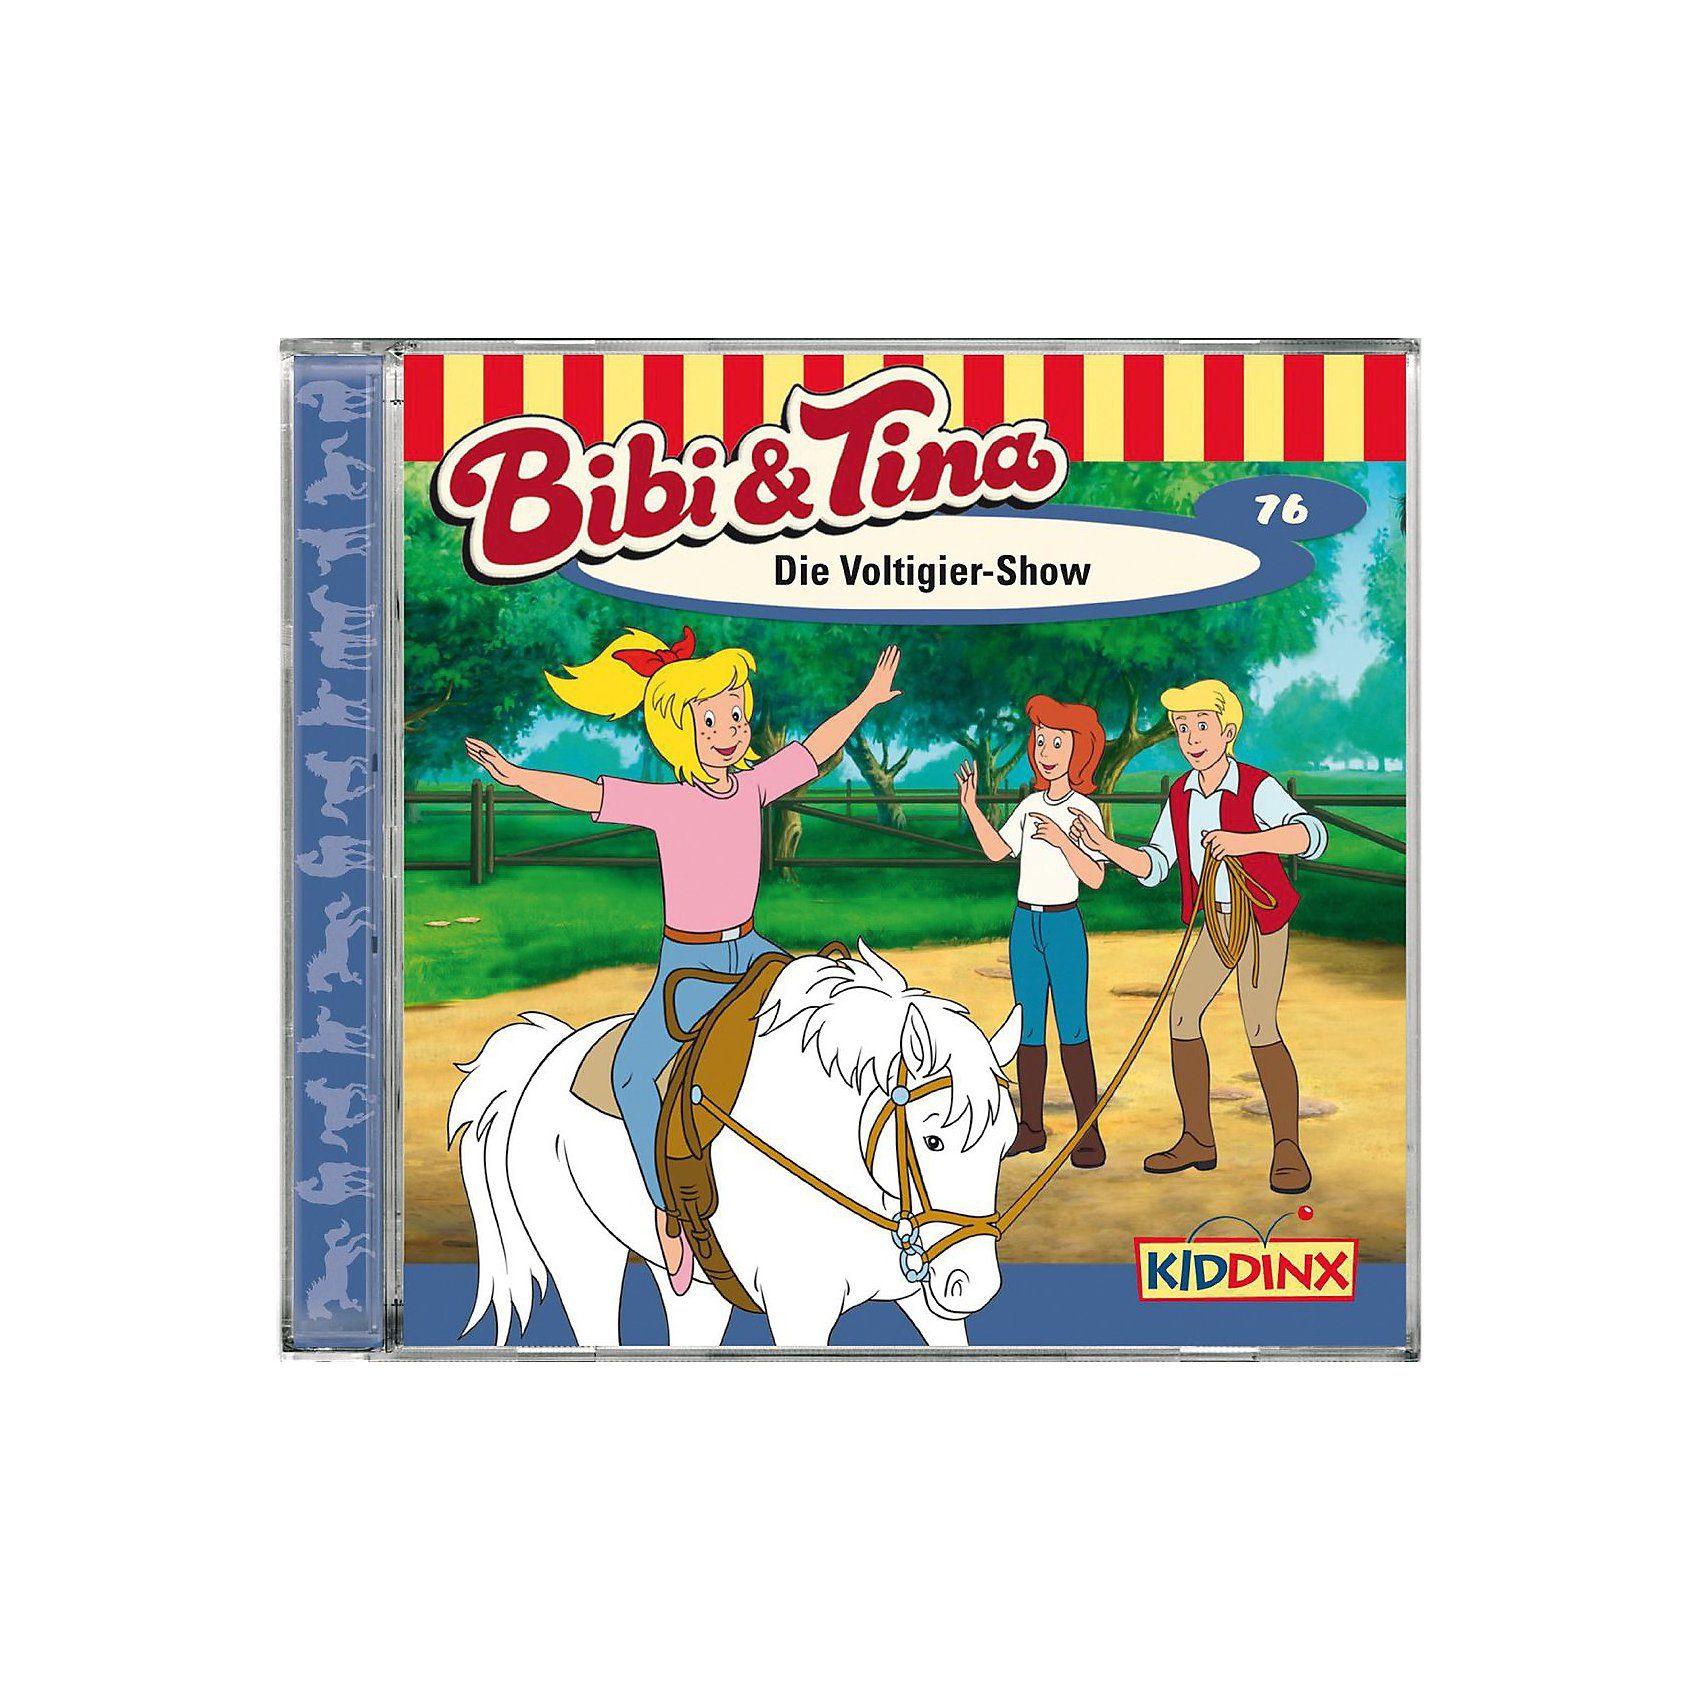 Kiddinx CD Bibi & Tina 76 - Die Voltigier Show